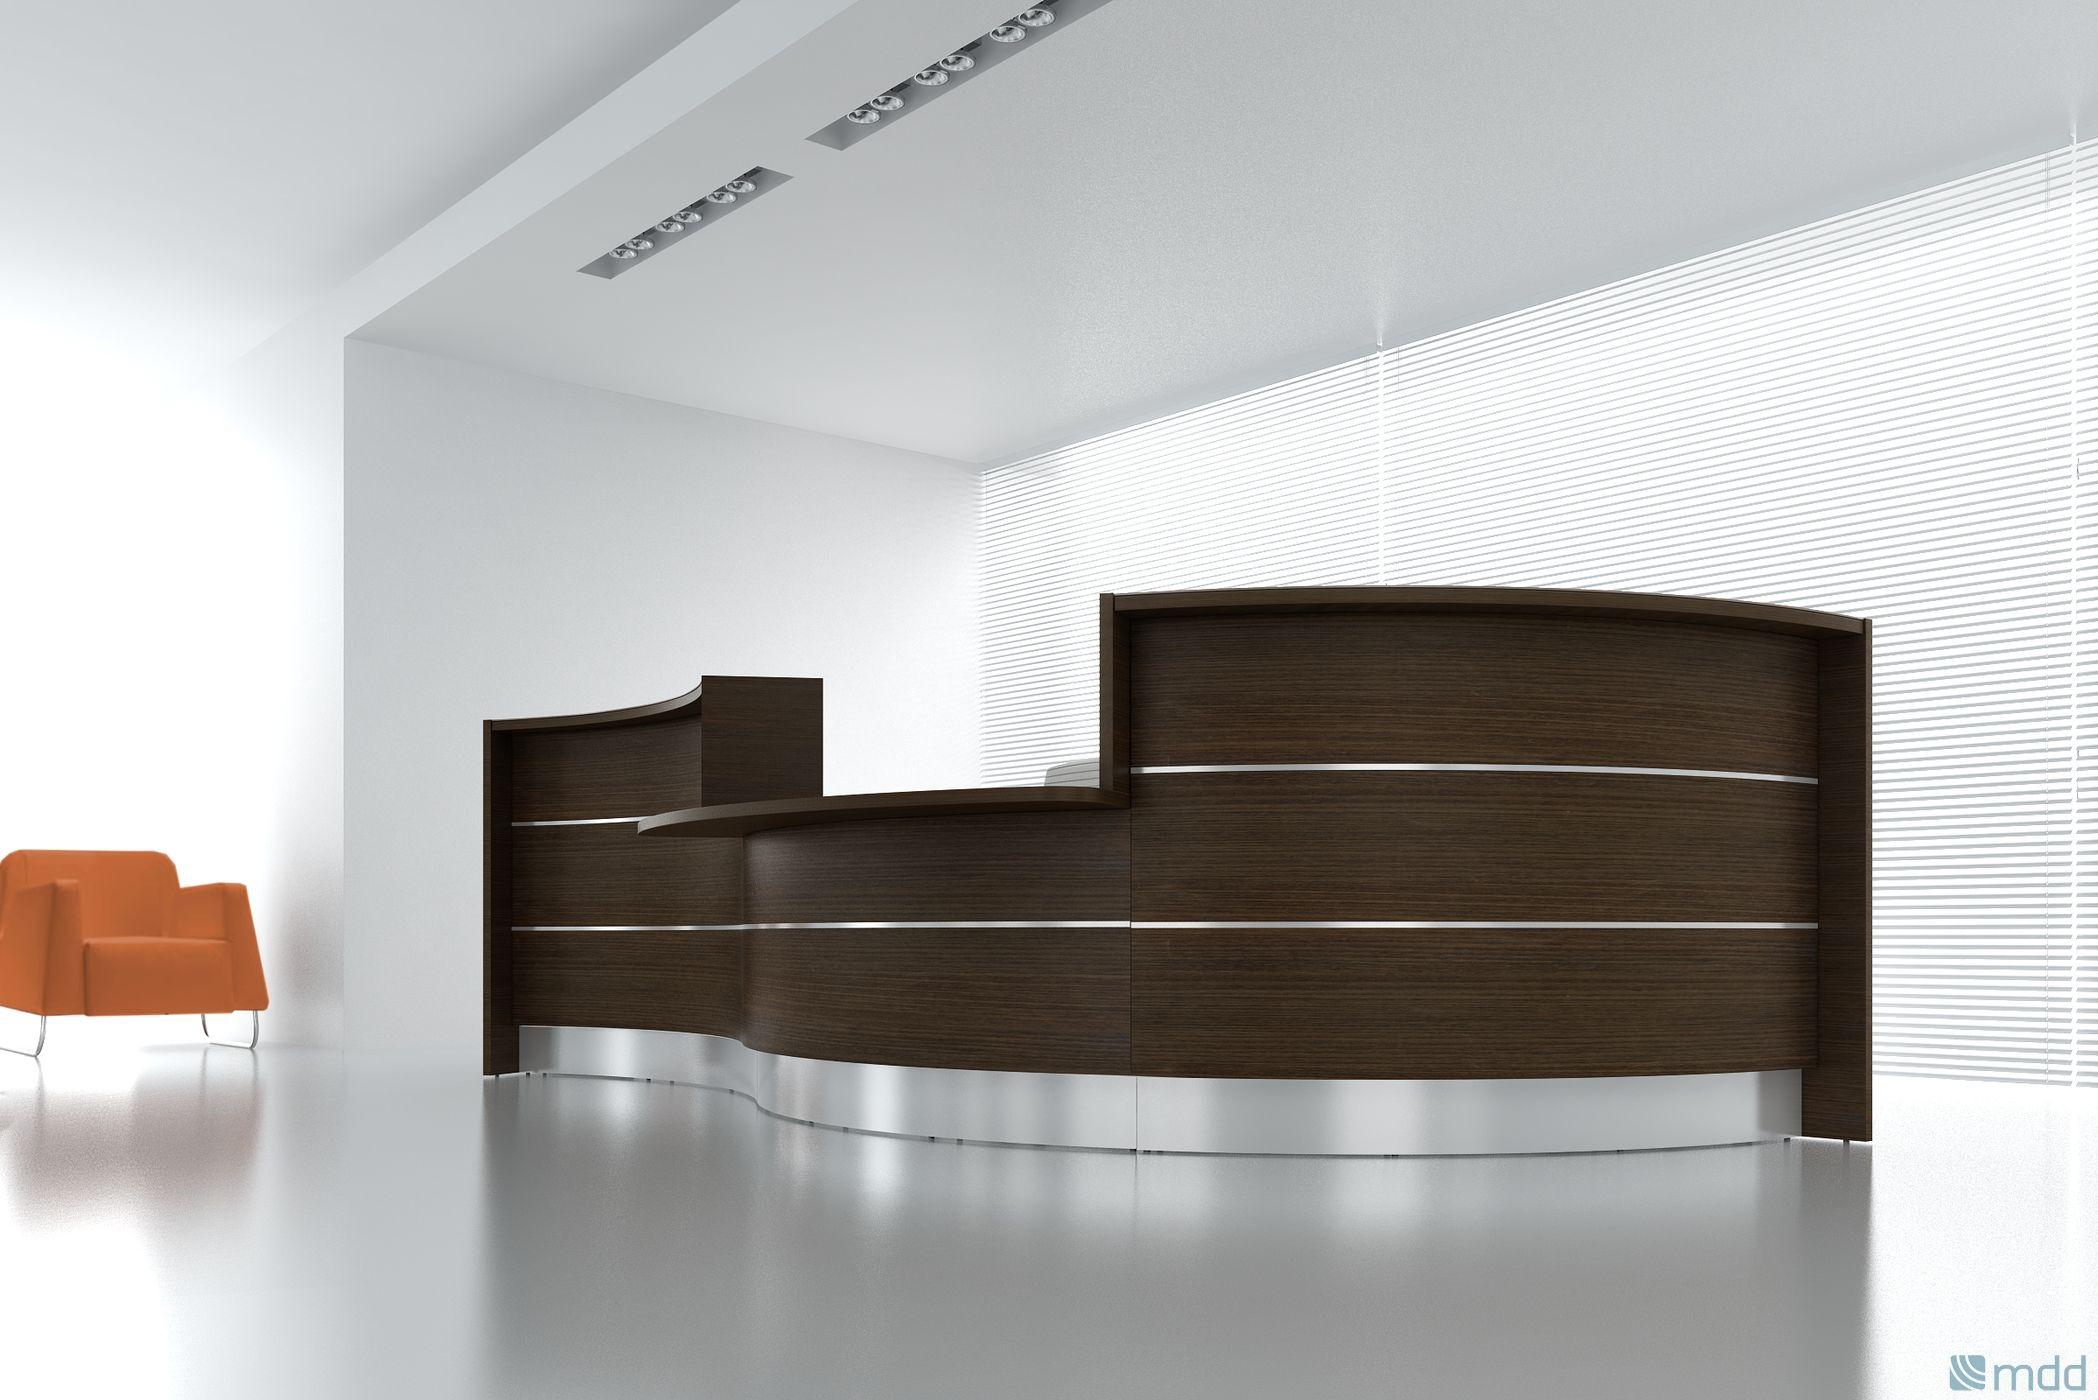 Offers Modern, Contemporary And Custom Reception Desks, Receptionist Desks And